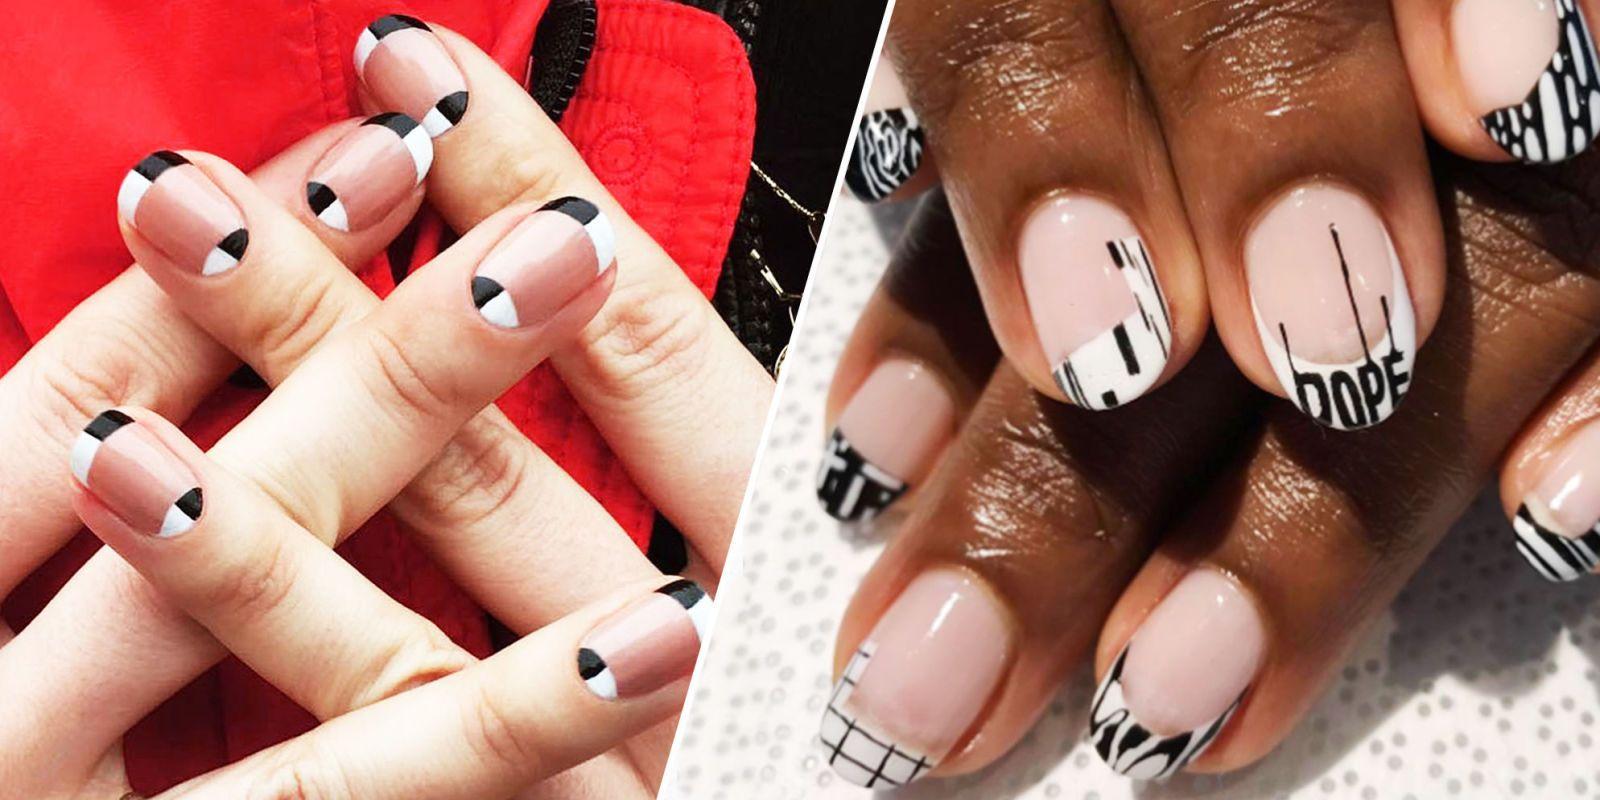 17 New Ways to Wear a French Manicure | Manicure, Manicure nail ...